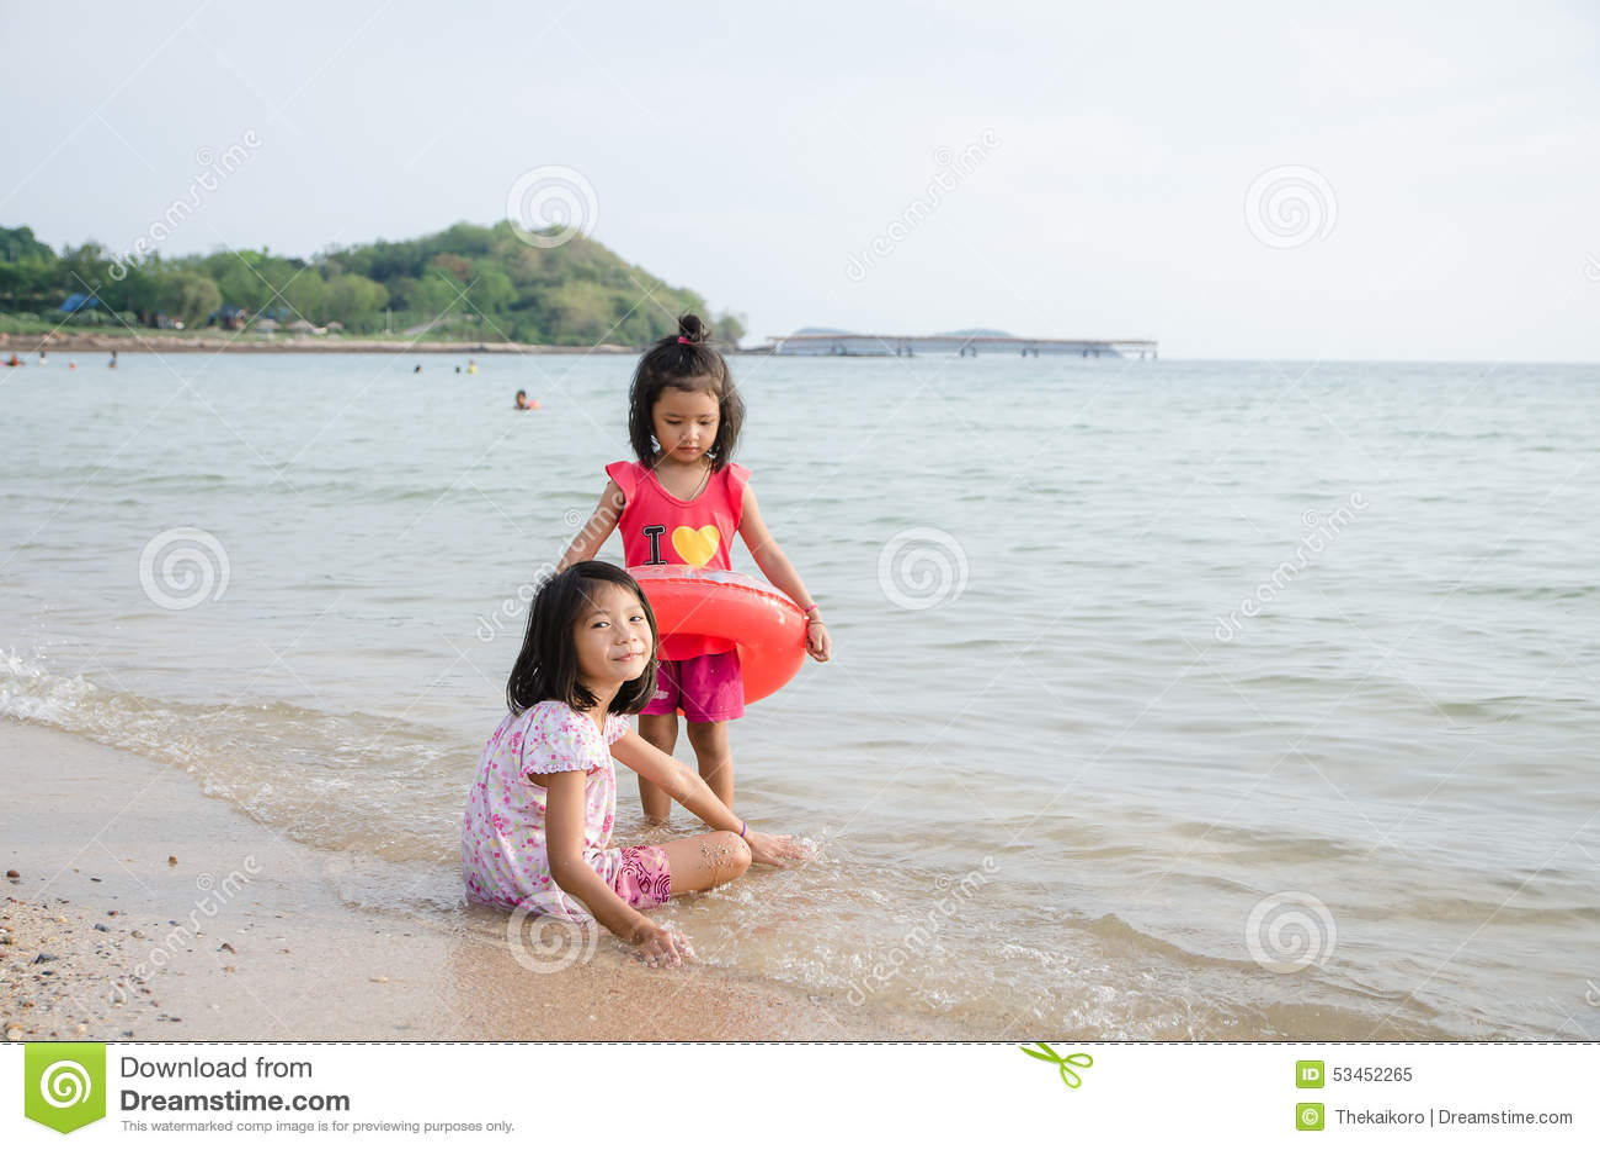 Тайские девочки порноонлайн 8 фотография